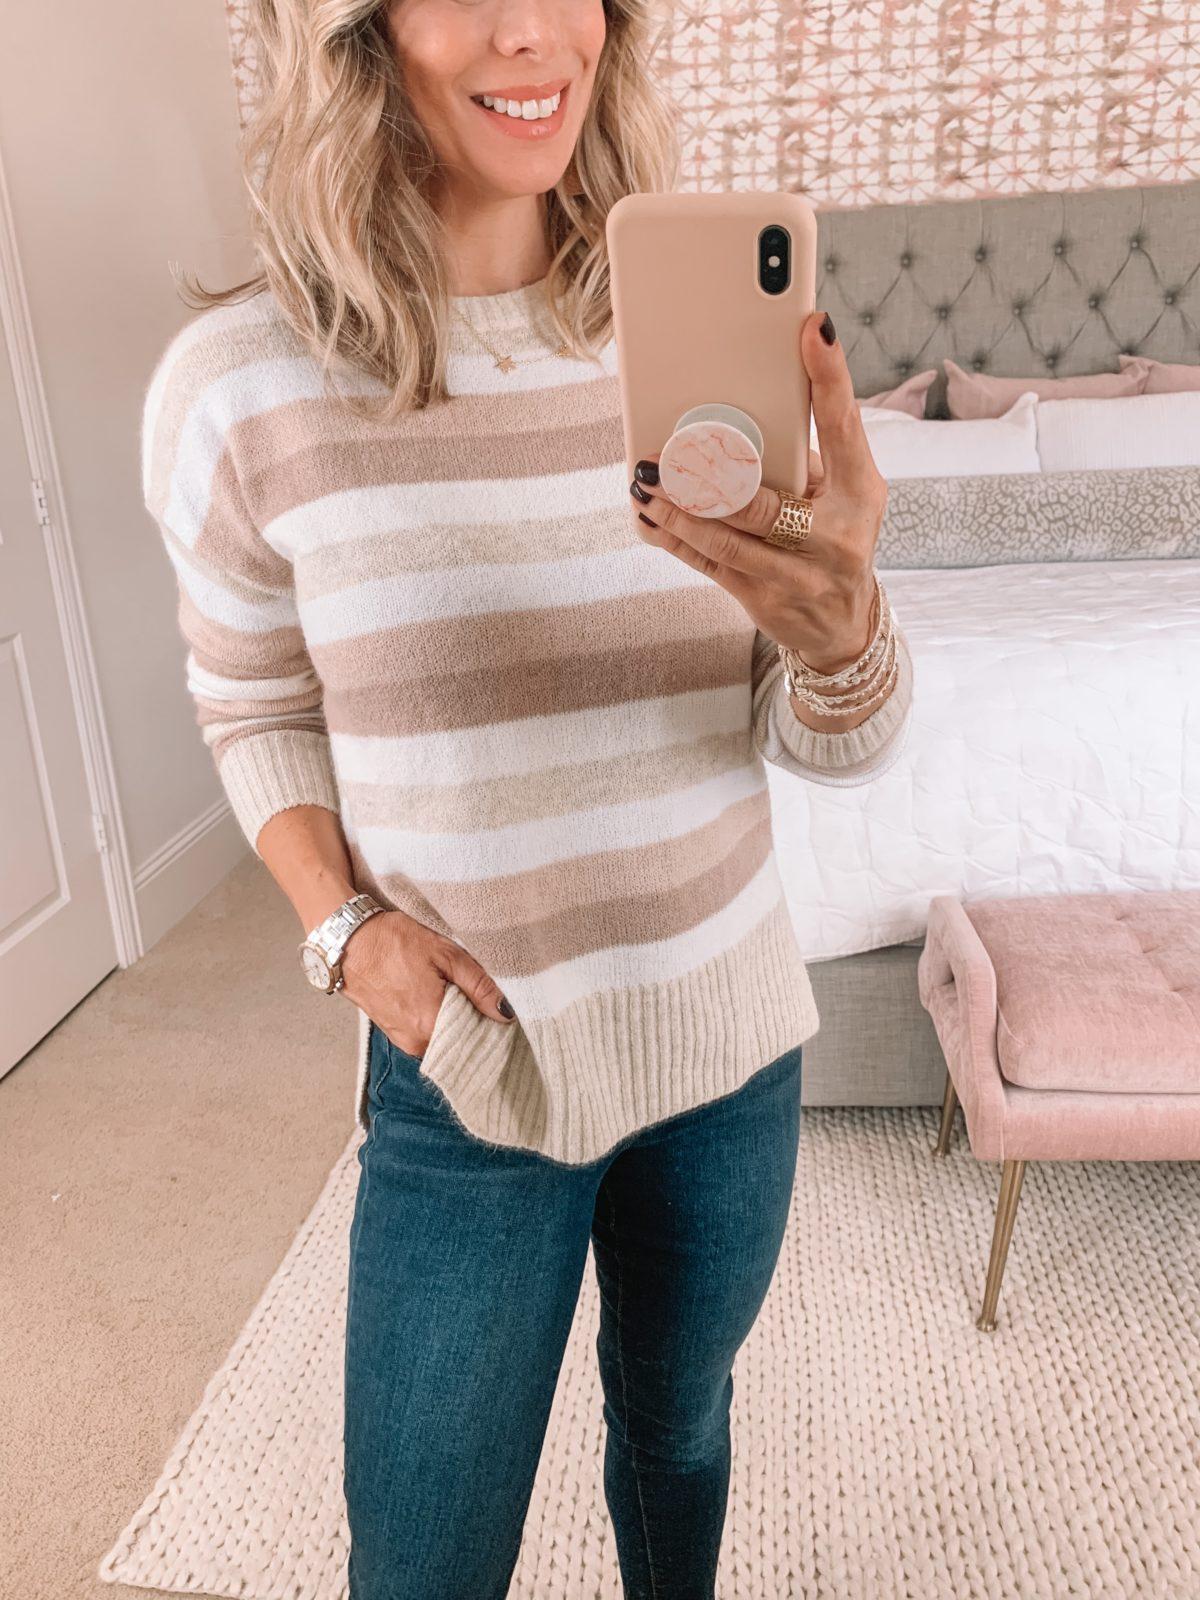 Walmart Fashion, Striped Sweater, Jeans